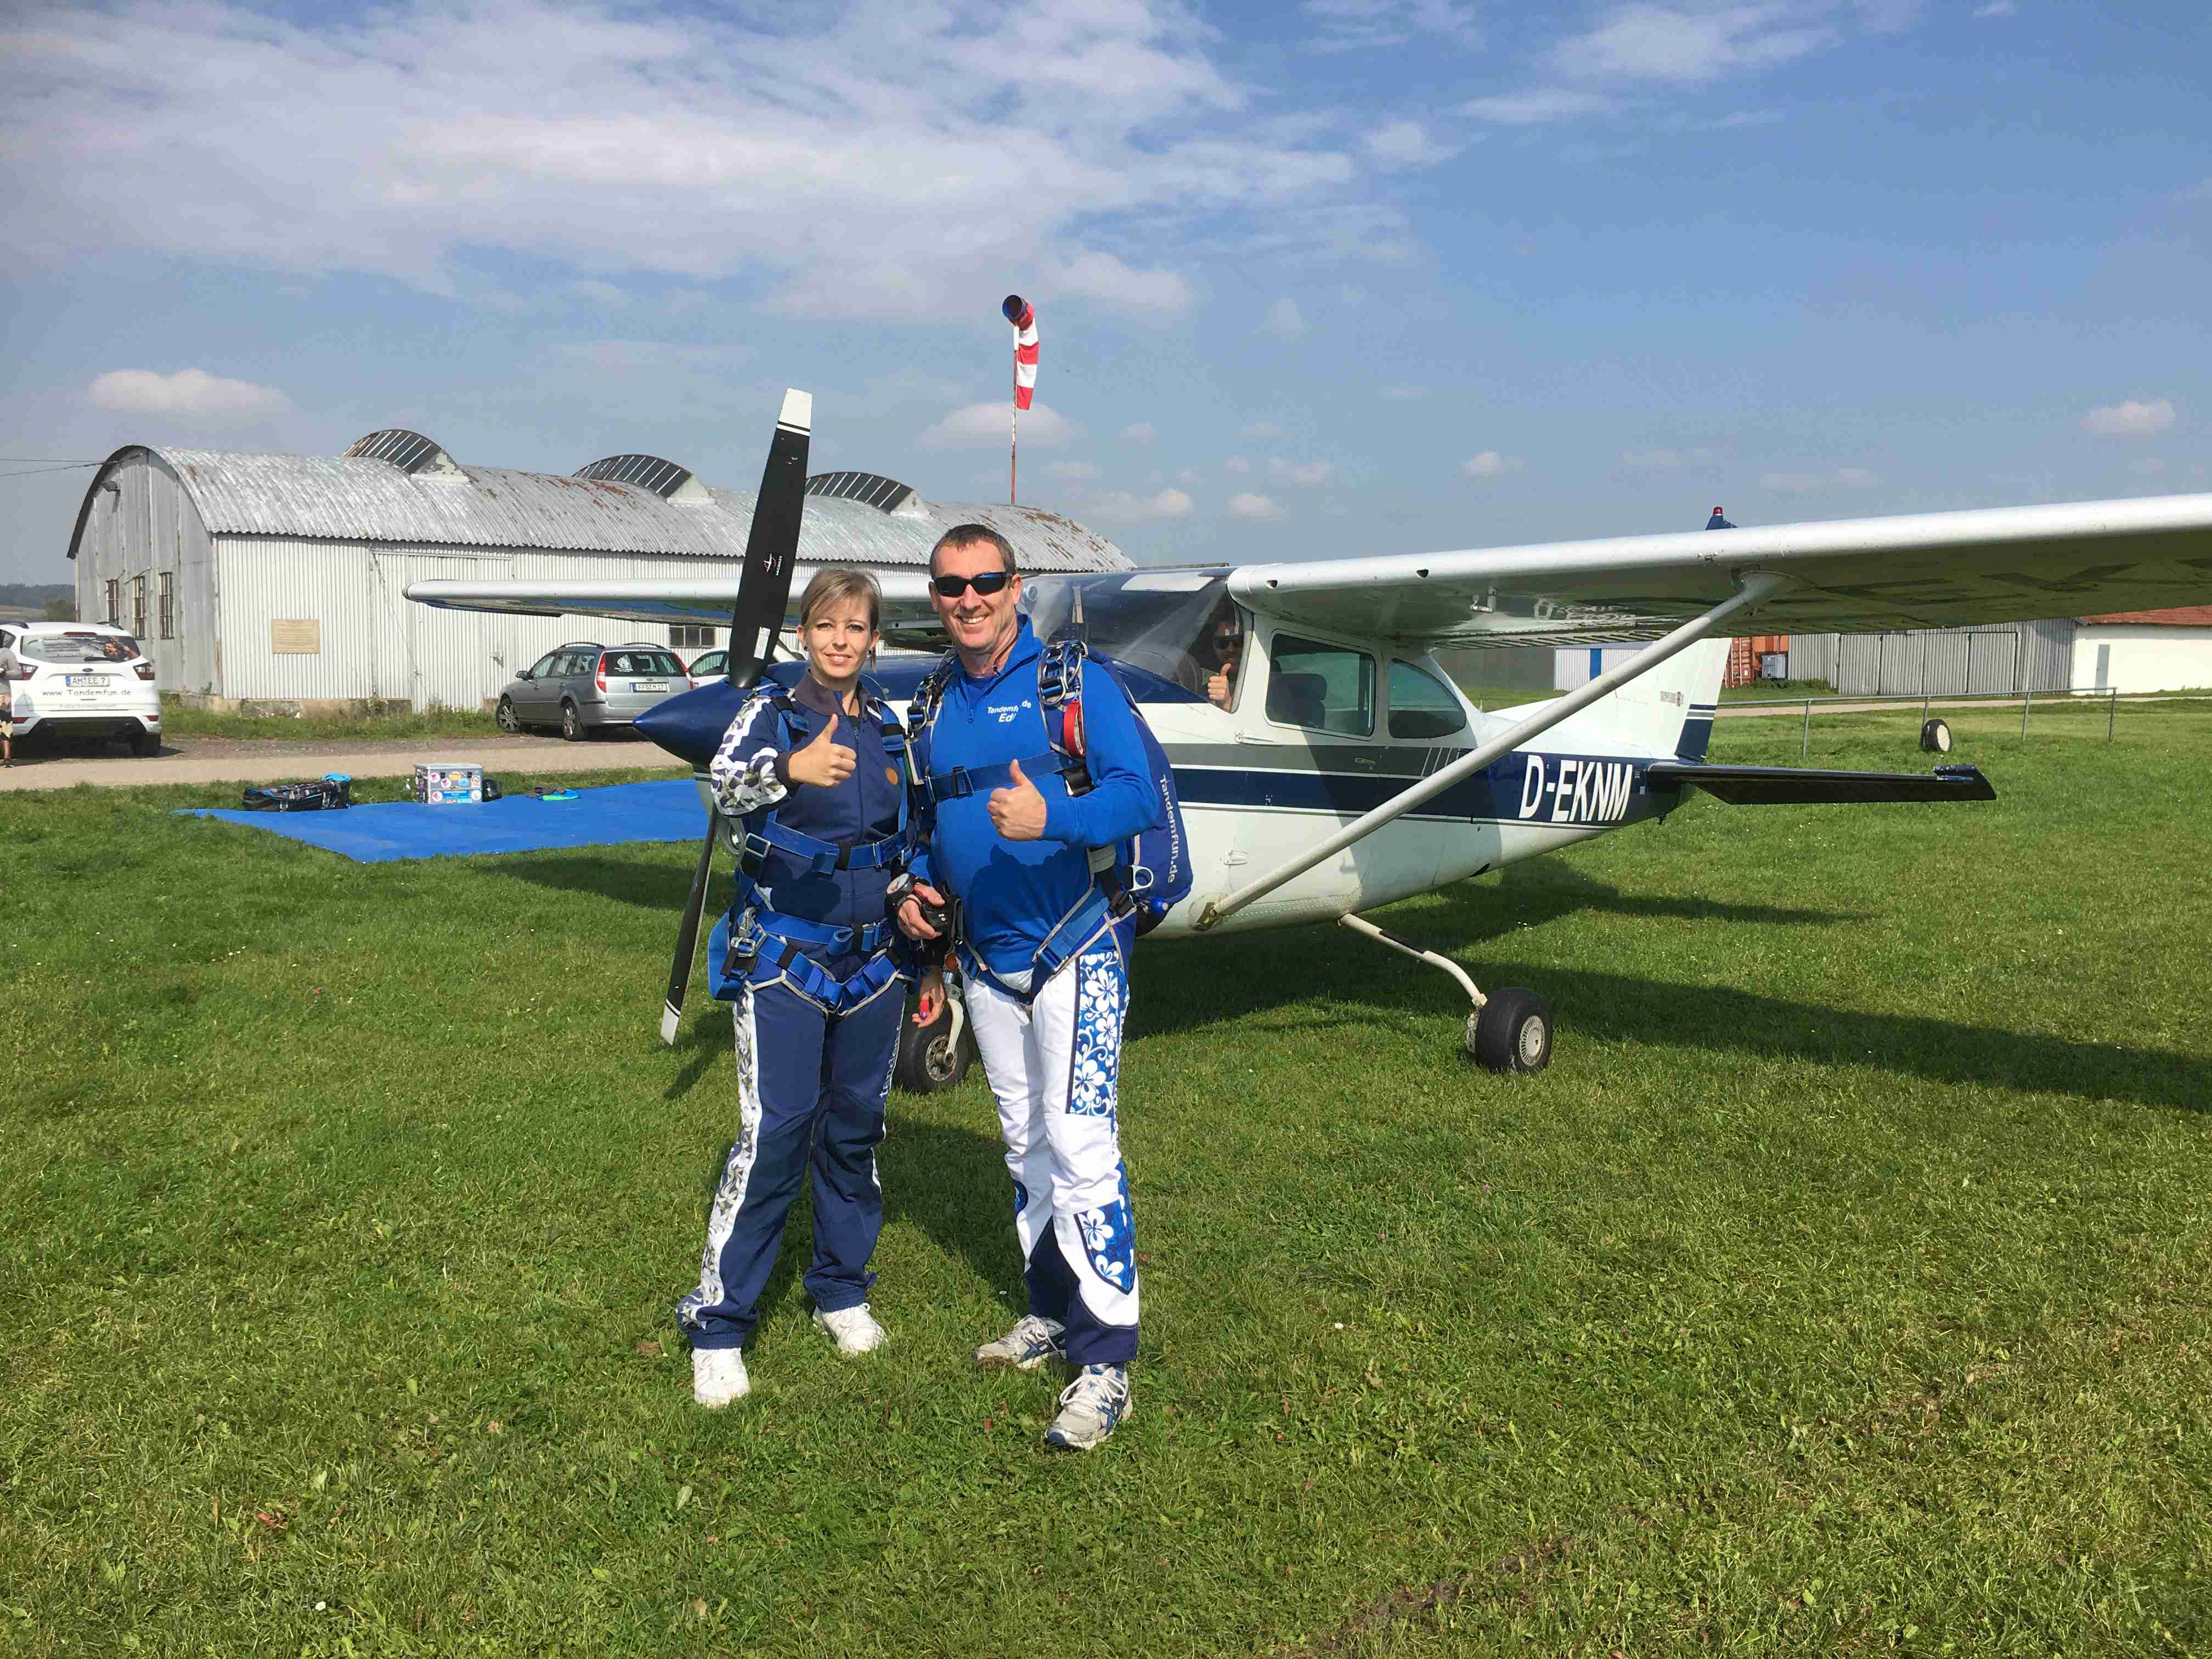 Fallschirmsprung-Dingolfing-Niederbayern5a141f4028fb9